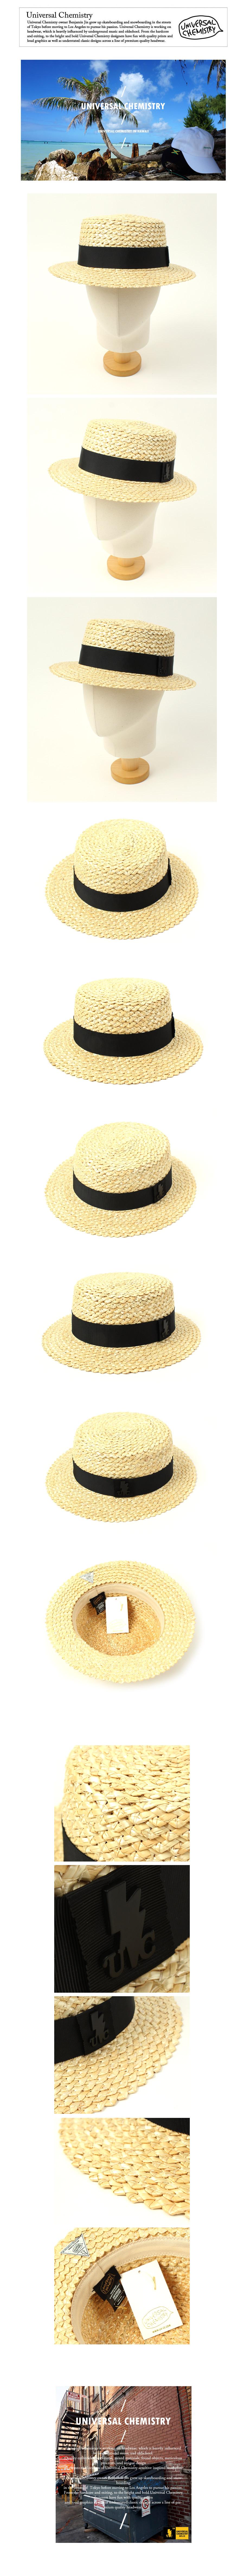 BKMT Origami Panama Hat 여름페도라